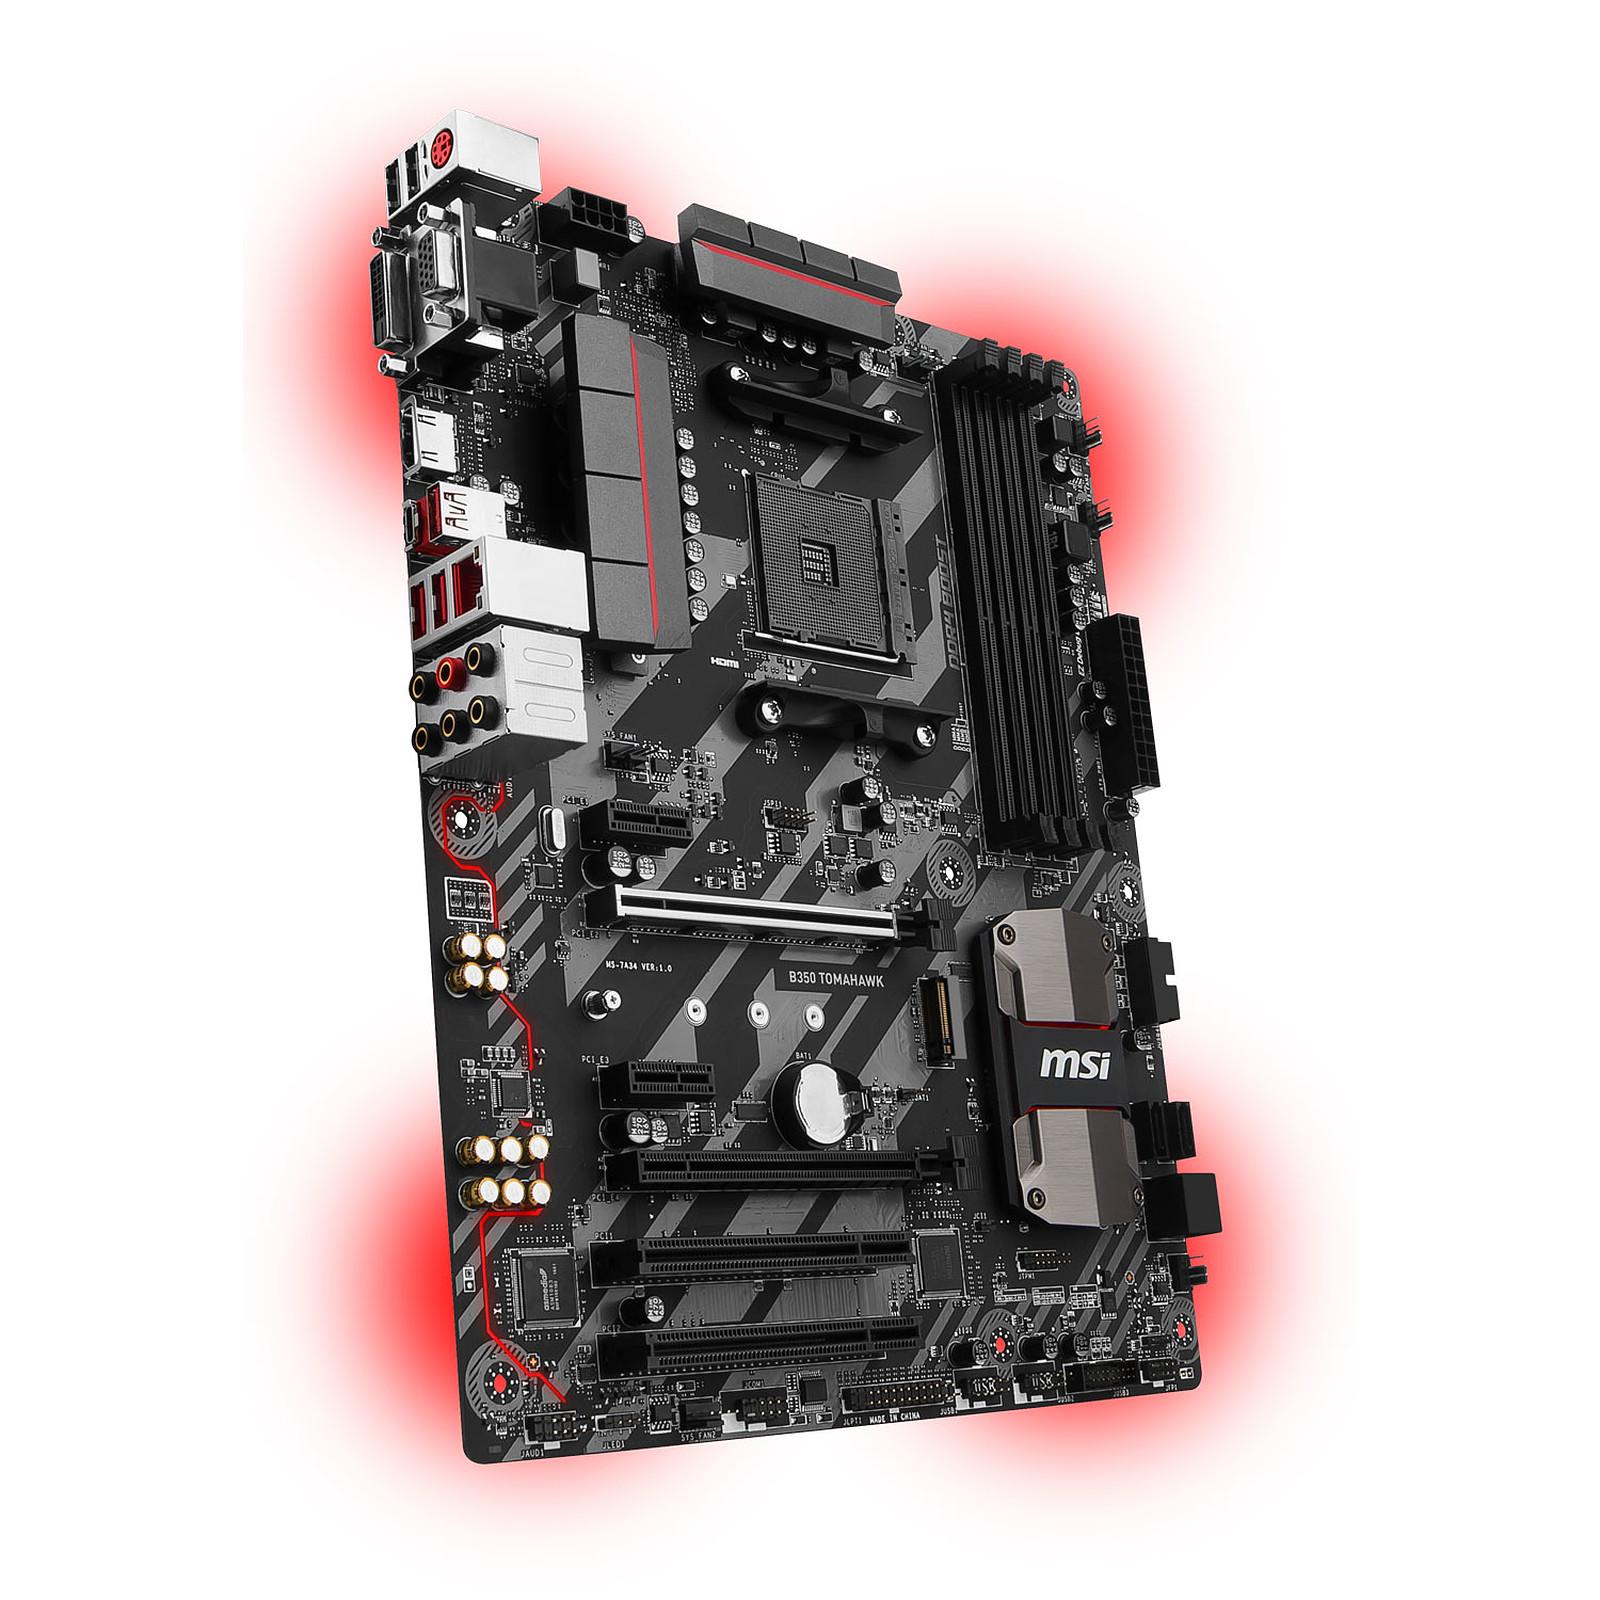 AMD Ryzen 7 1700X (3.4 GHz) + MSI B350 TOMAHAWK - Processeur AMD sur  LDLC.com 94dc21092b7f